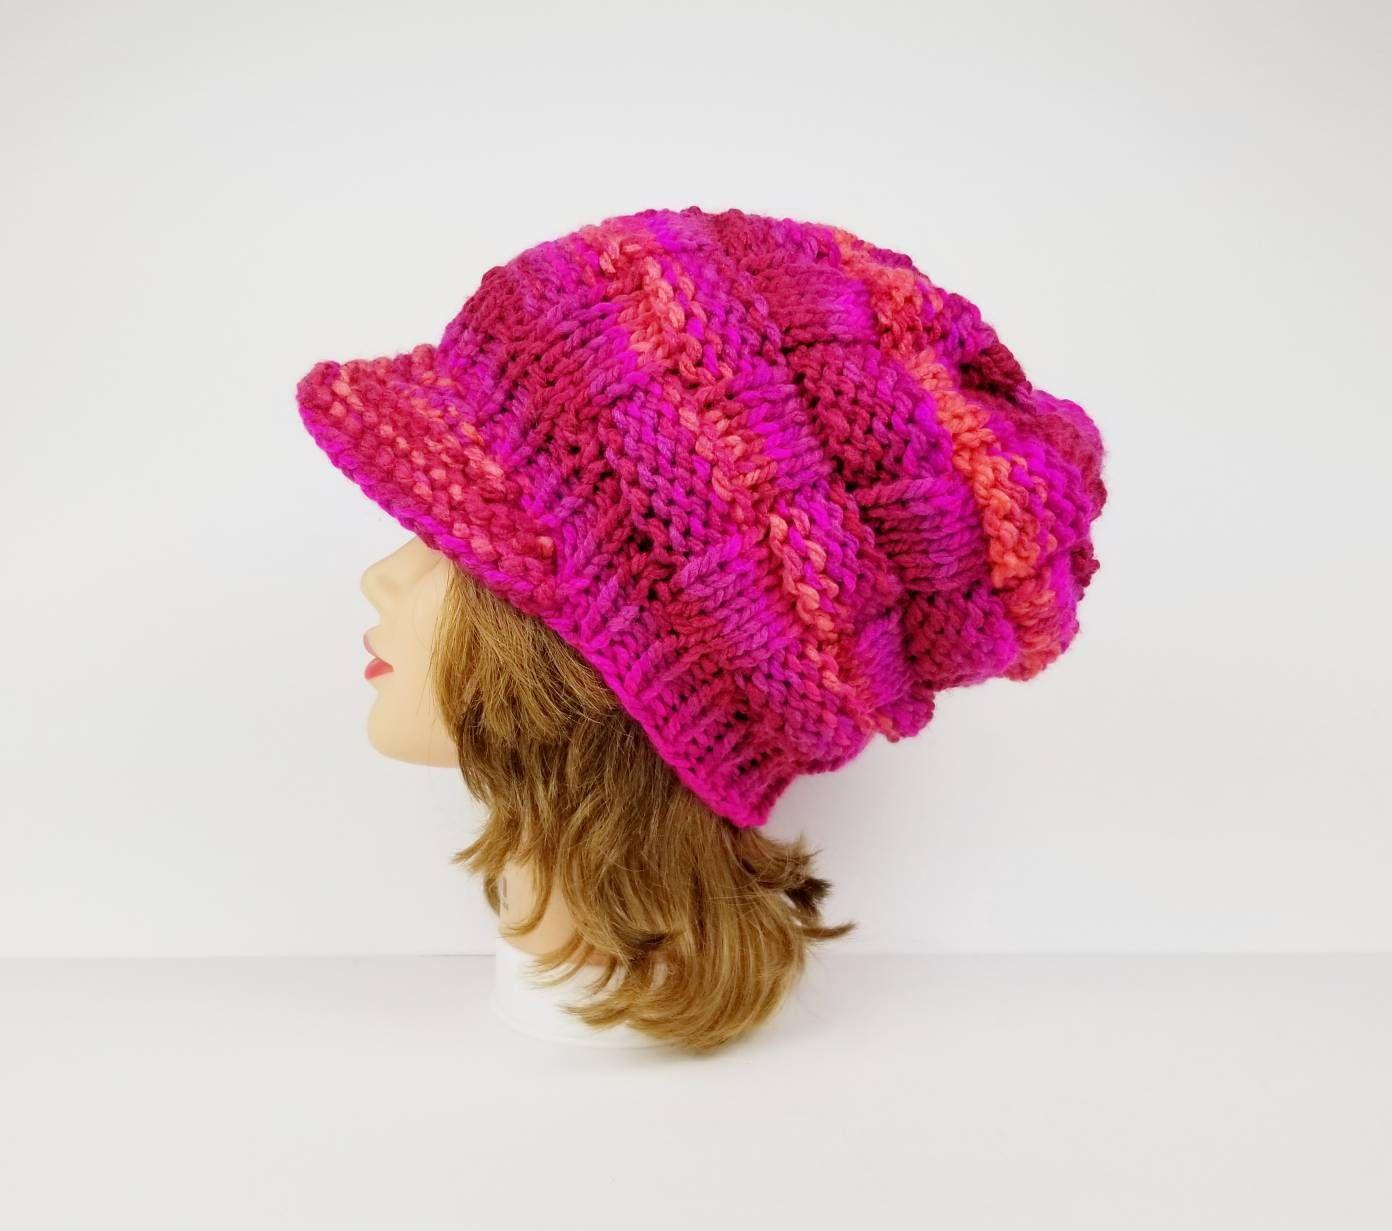 Newsboy Hat Visor Beanie Hat Chunky Knit Hat Women S Etsy Knitted Hats Chunky Knit Hat Visor Beanie